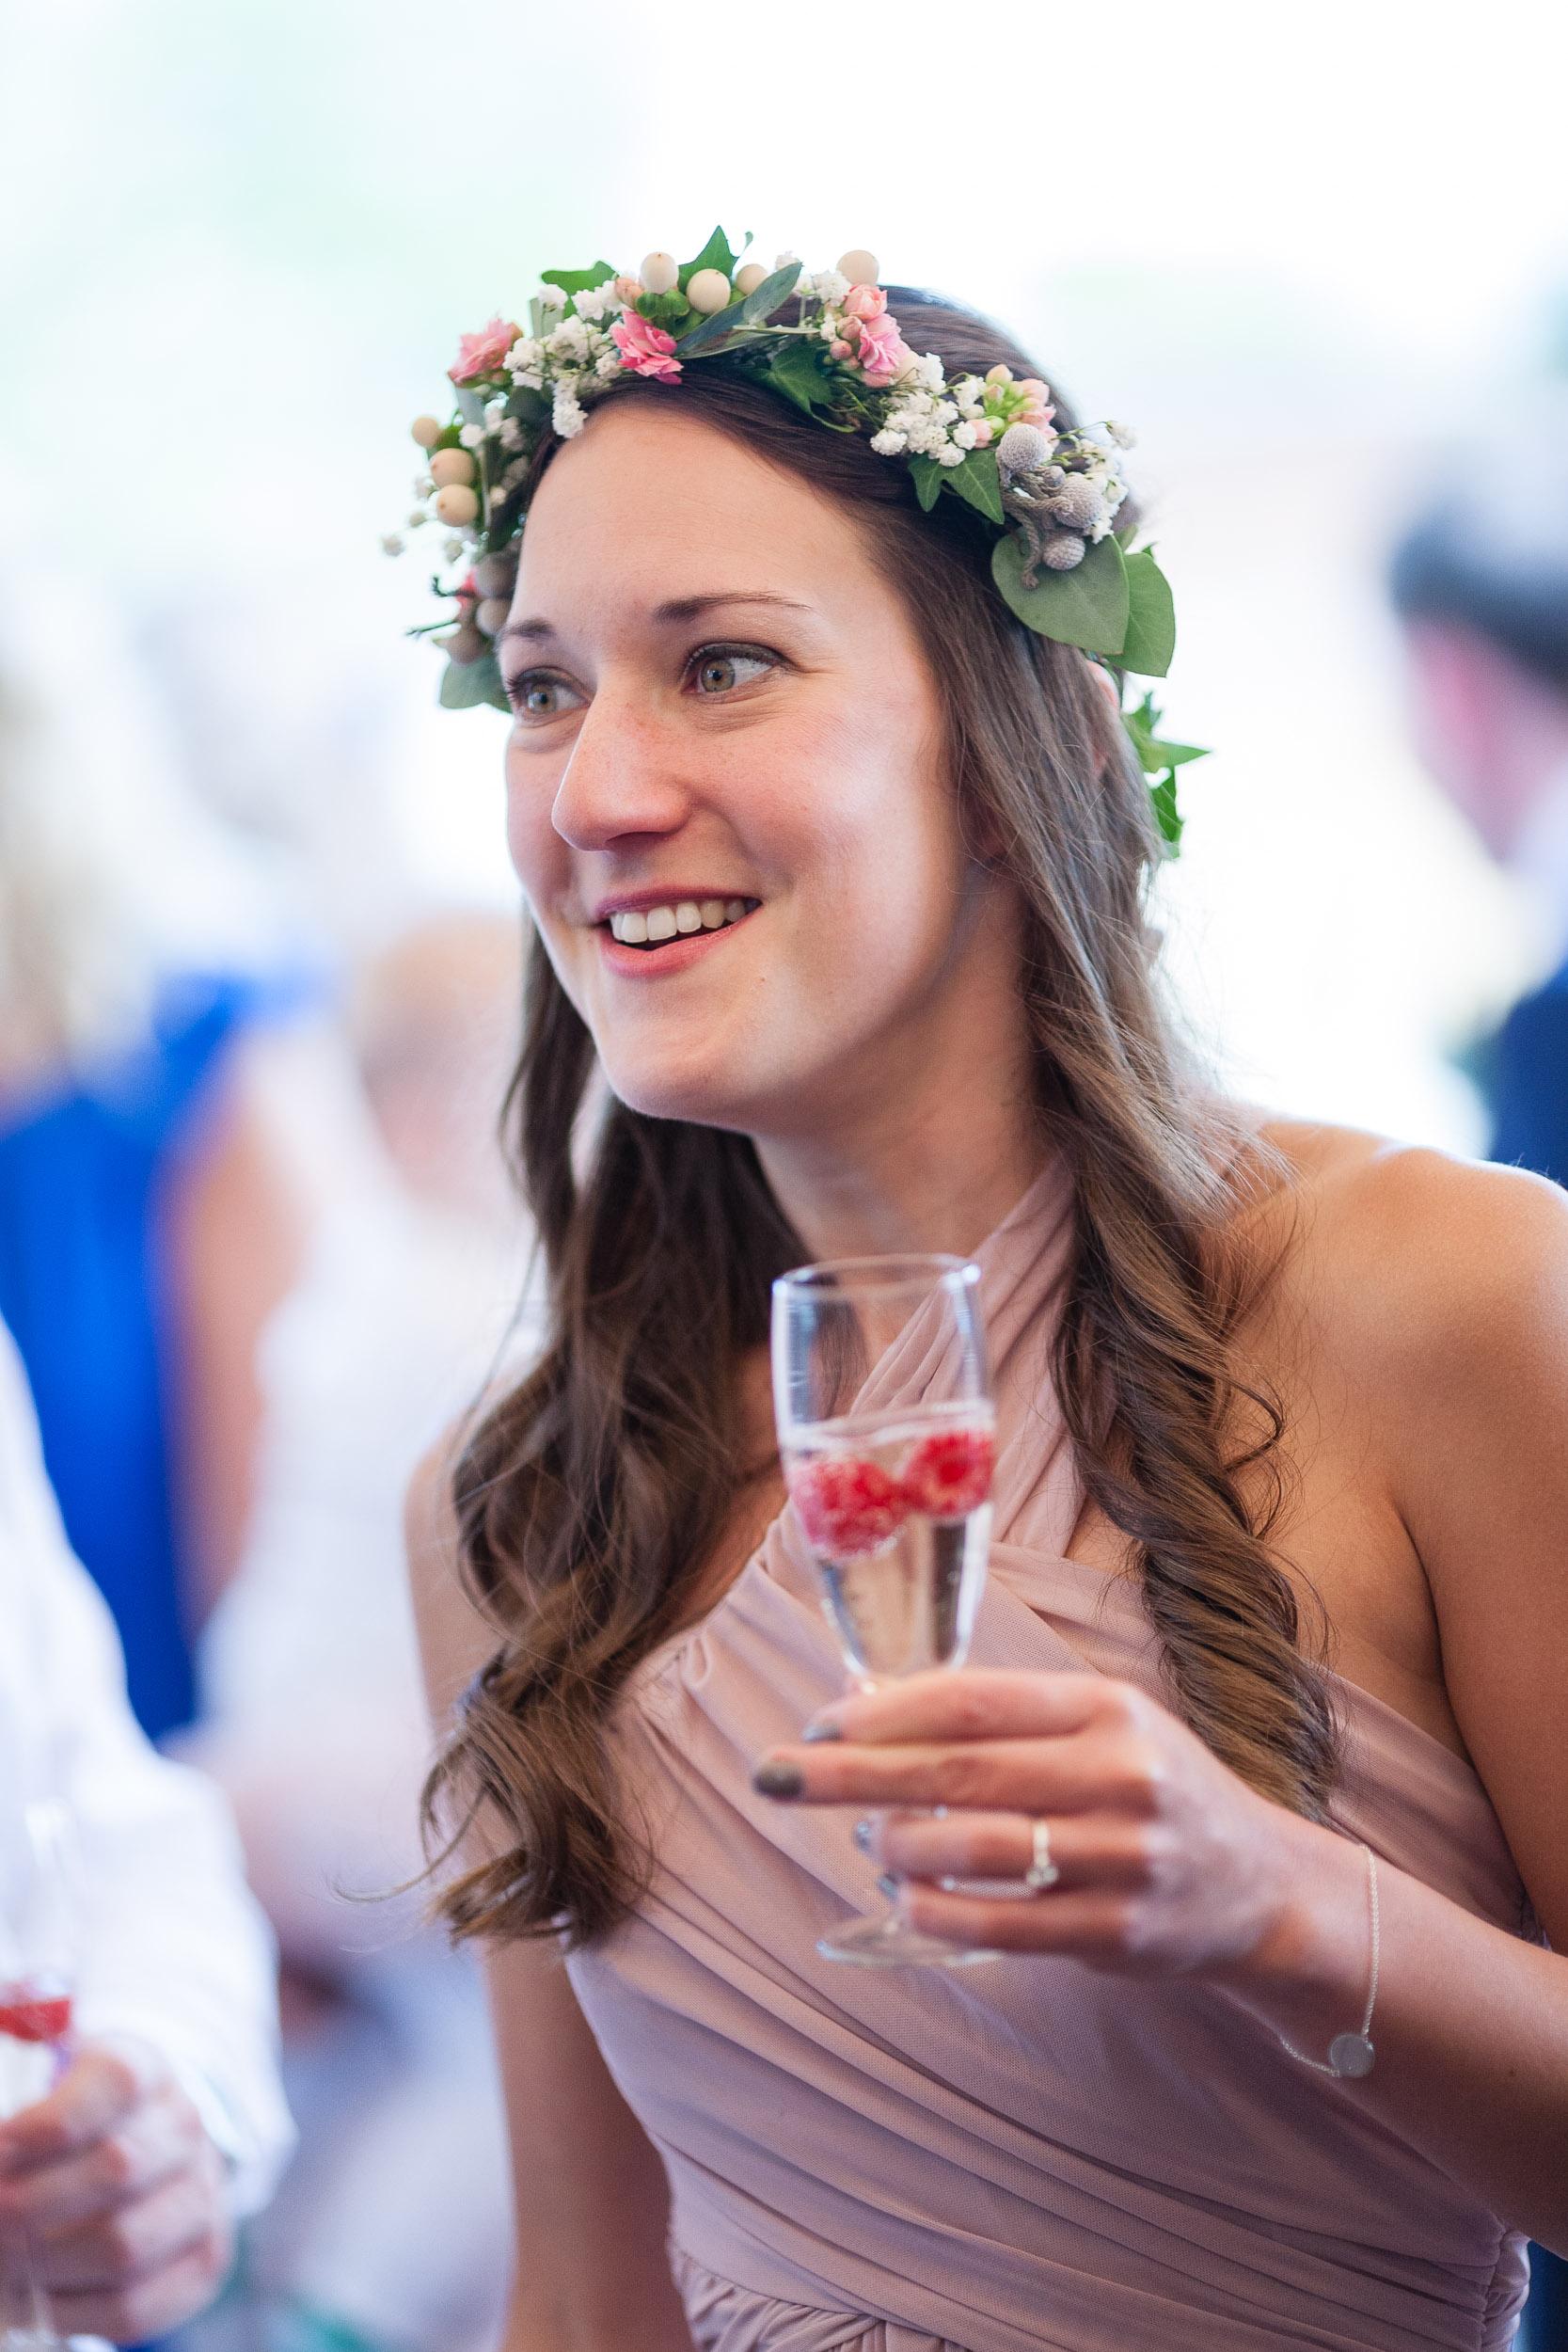 brockwell-lido-brixton-herne-hill-wedding-233.jpg